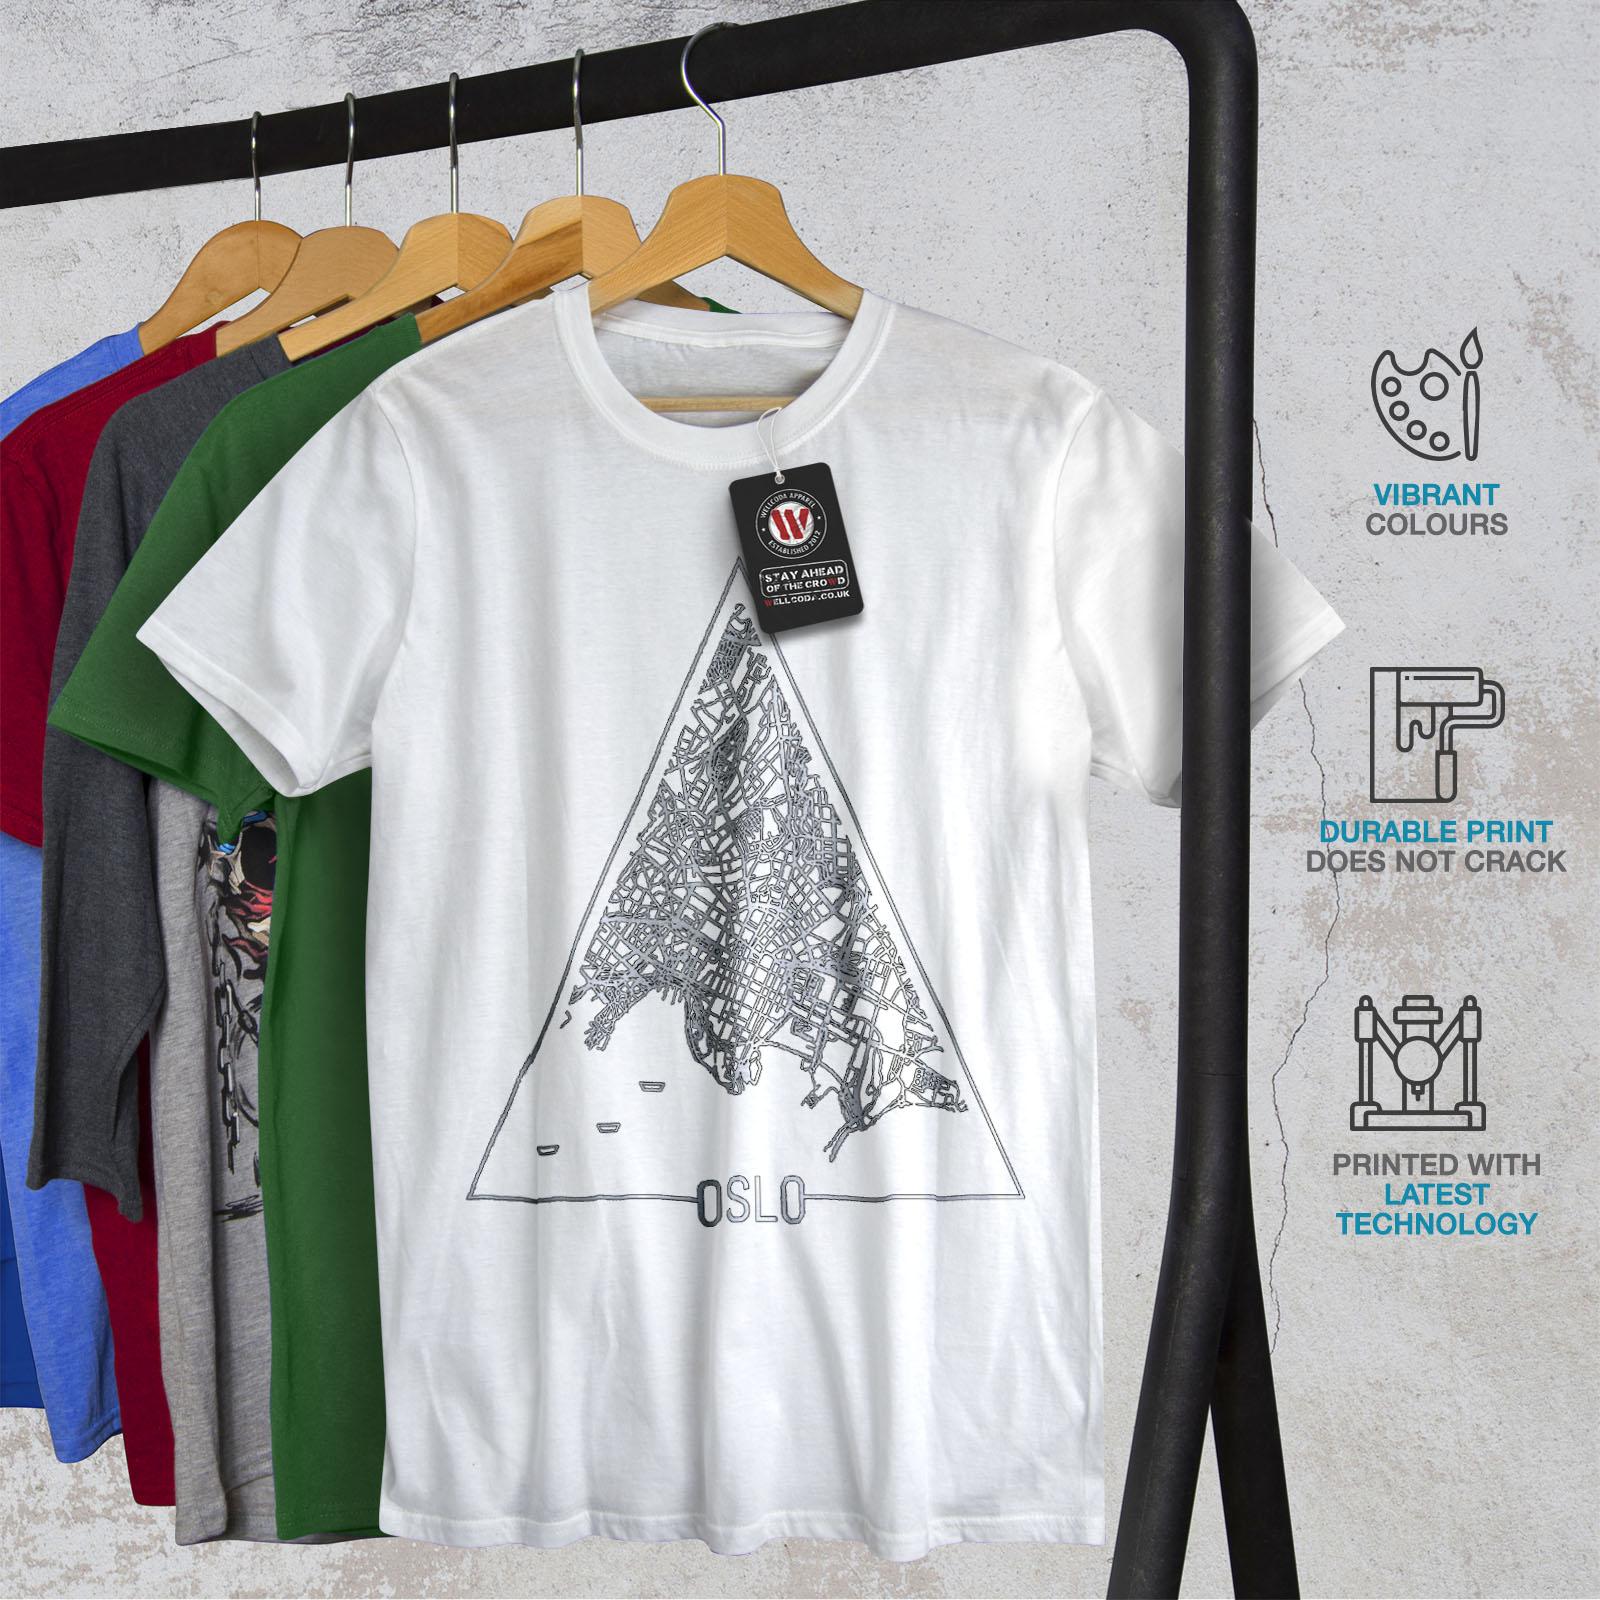 Wellcoda-Norvegia-Big-City-Oslo-da-uomo-T-shirt-Citta-design-grafico-stampato-T-shirt miniatura 12